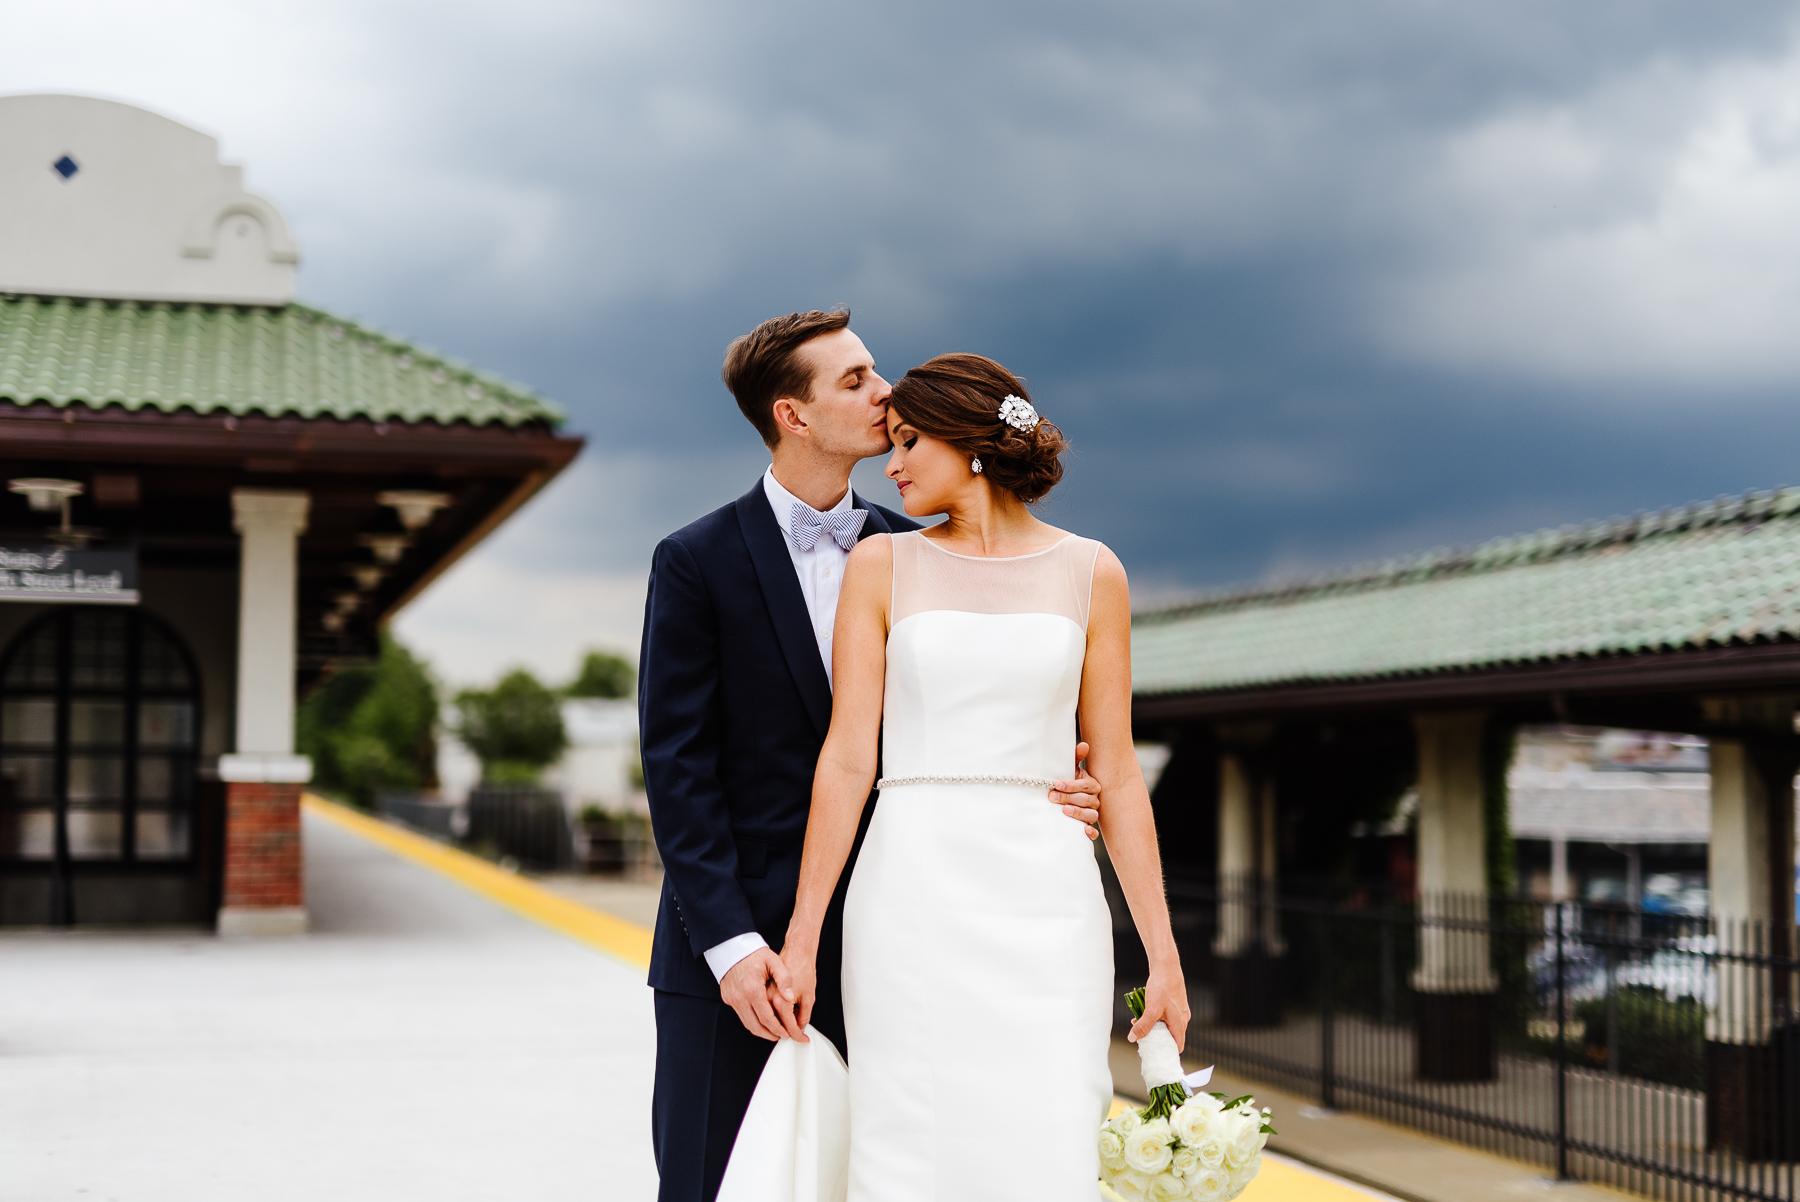 64-J Crew Wedding New Jersey Wedding Photographer J Crew Weddings.jpg